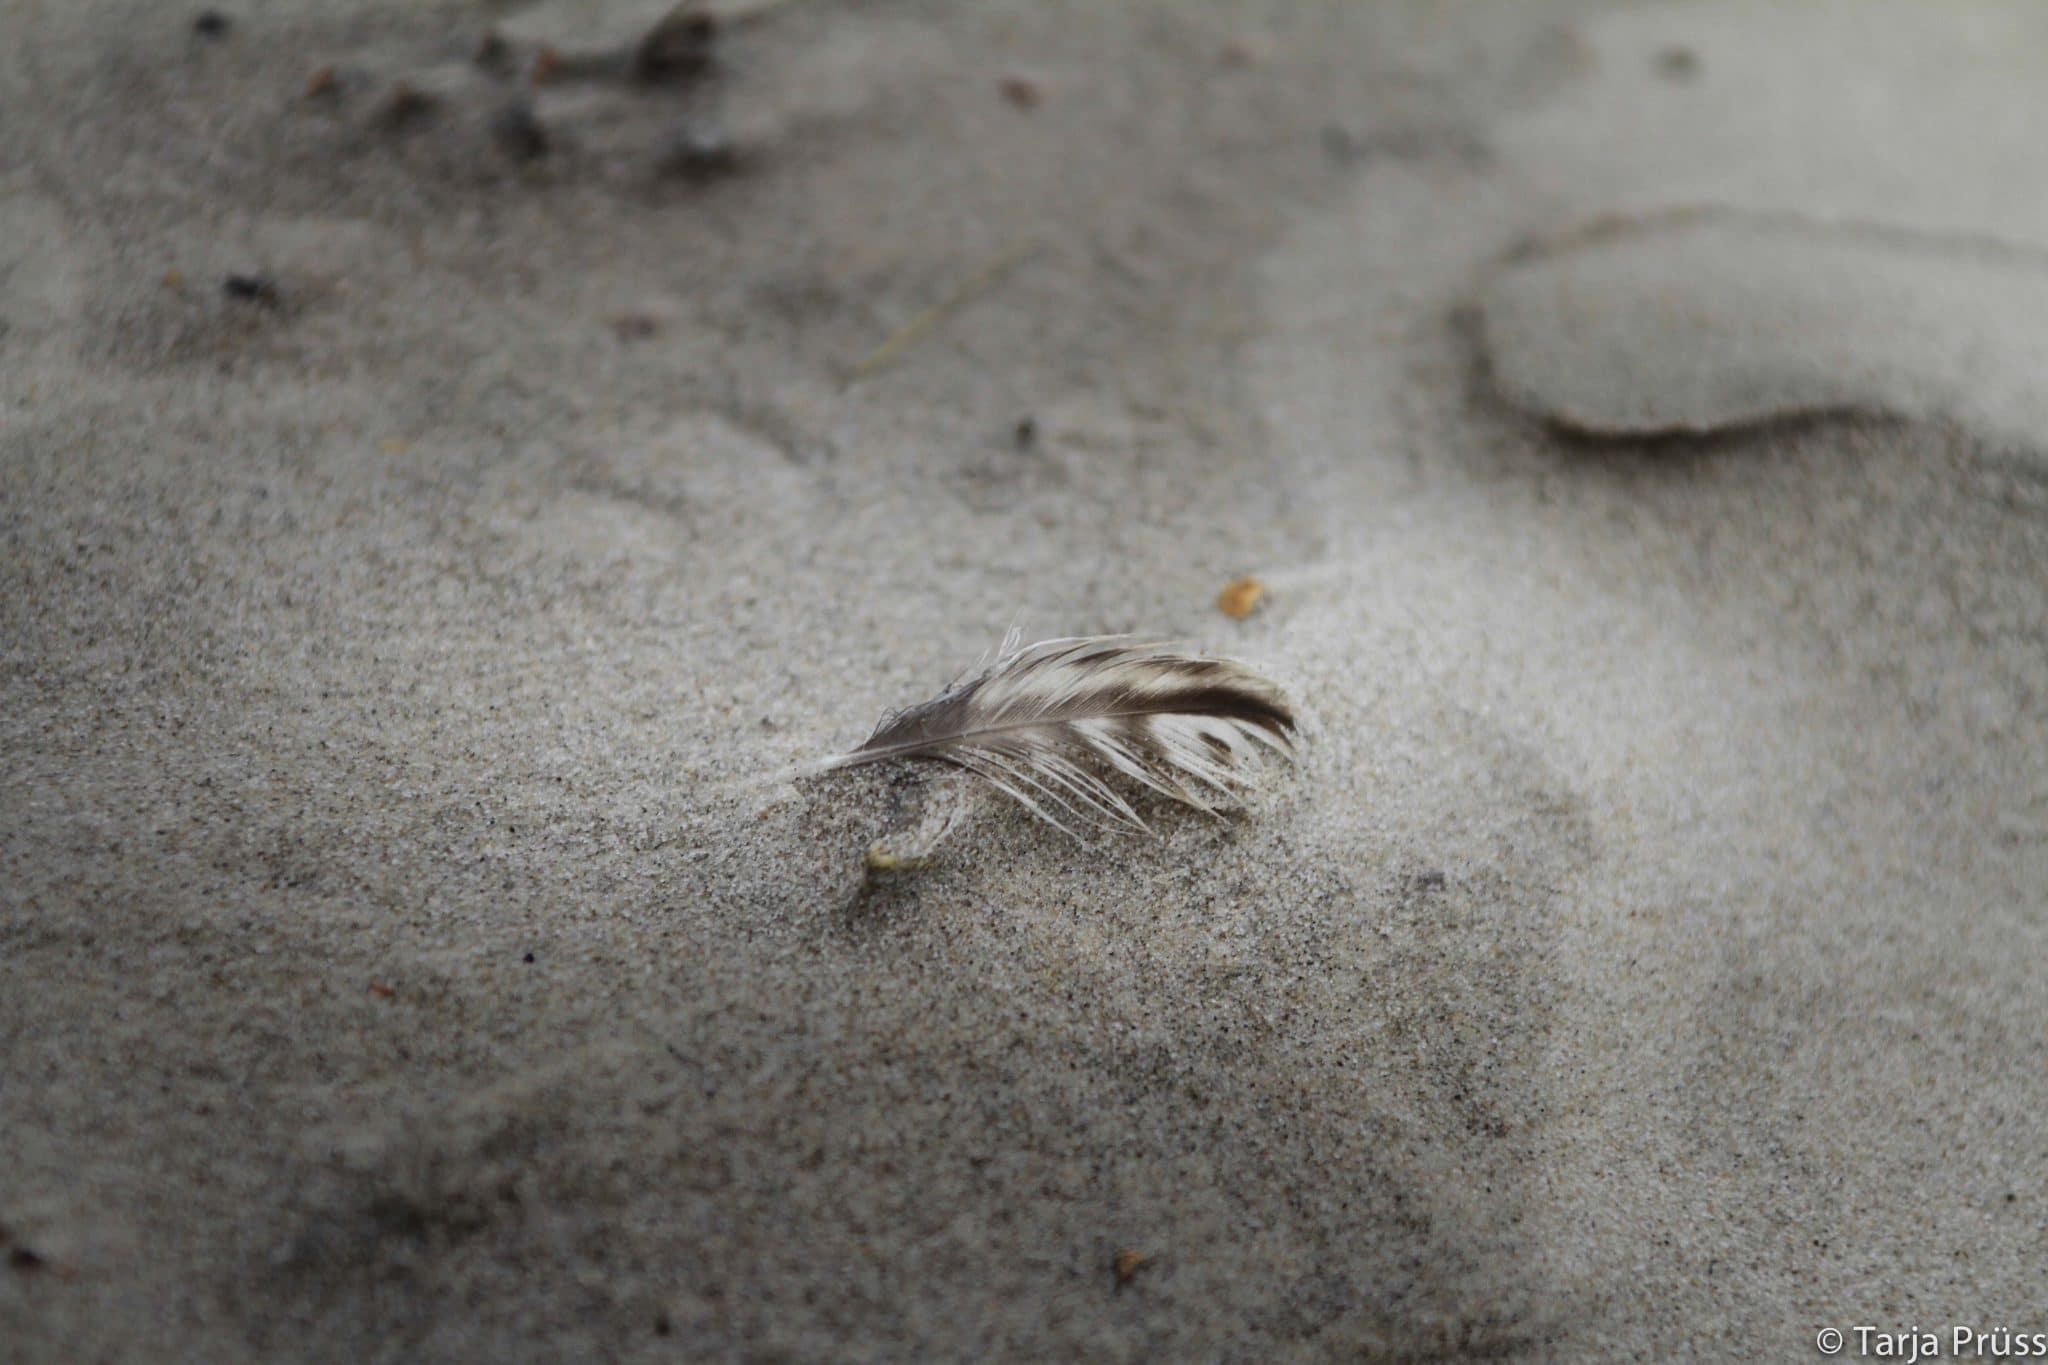 Strandgut - Feder im Sand ©Strandgut - Muschel im Sand © Tarja Prüss | Tarjas Blog - Alles über Finnland